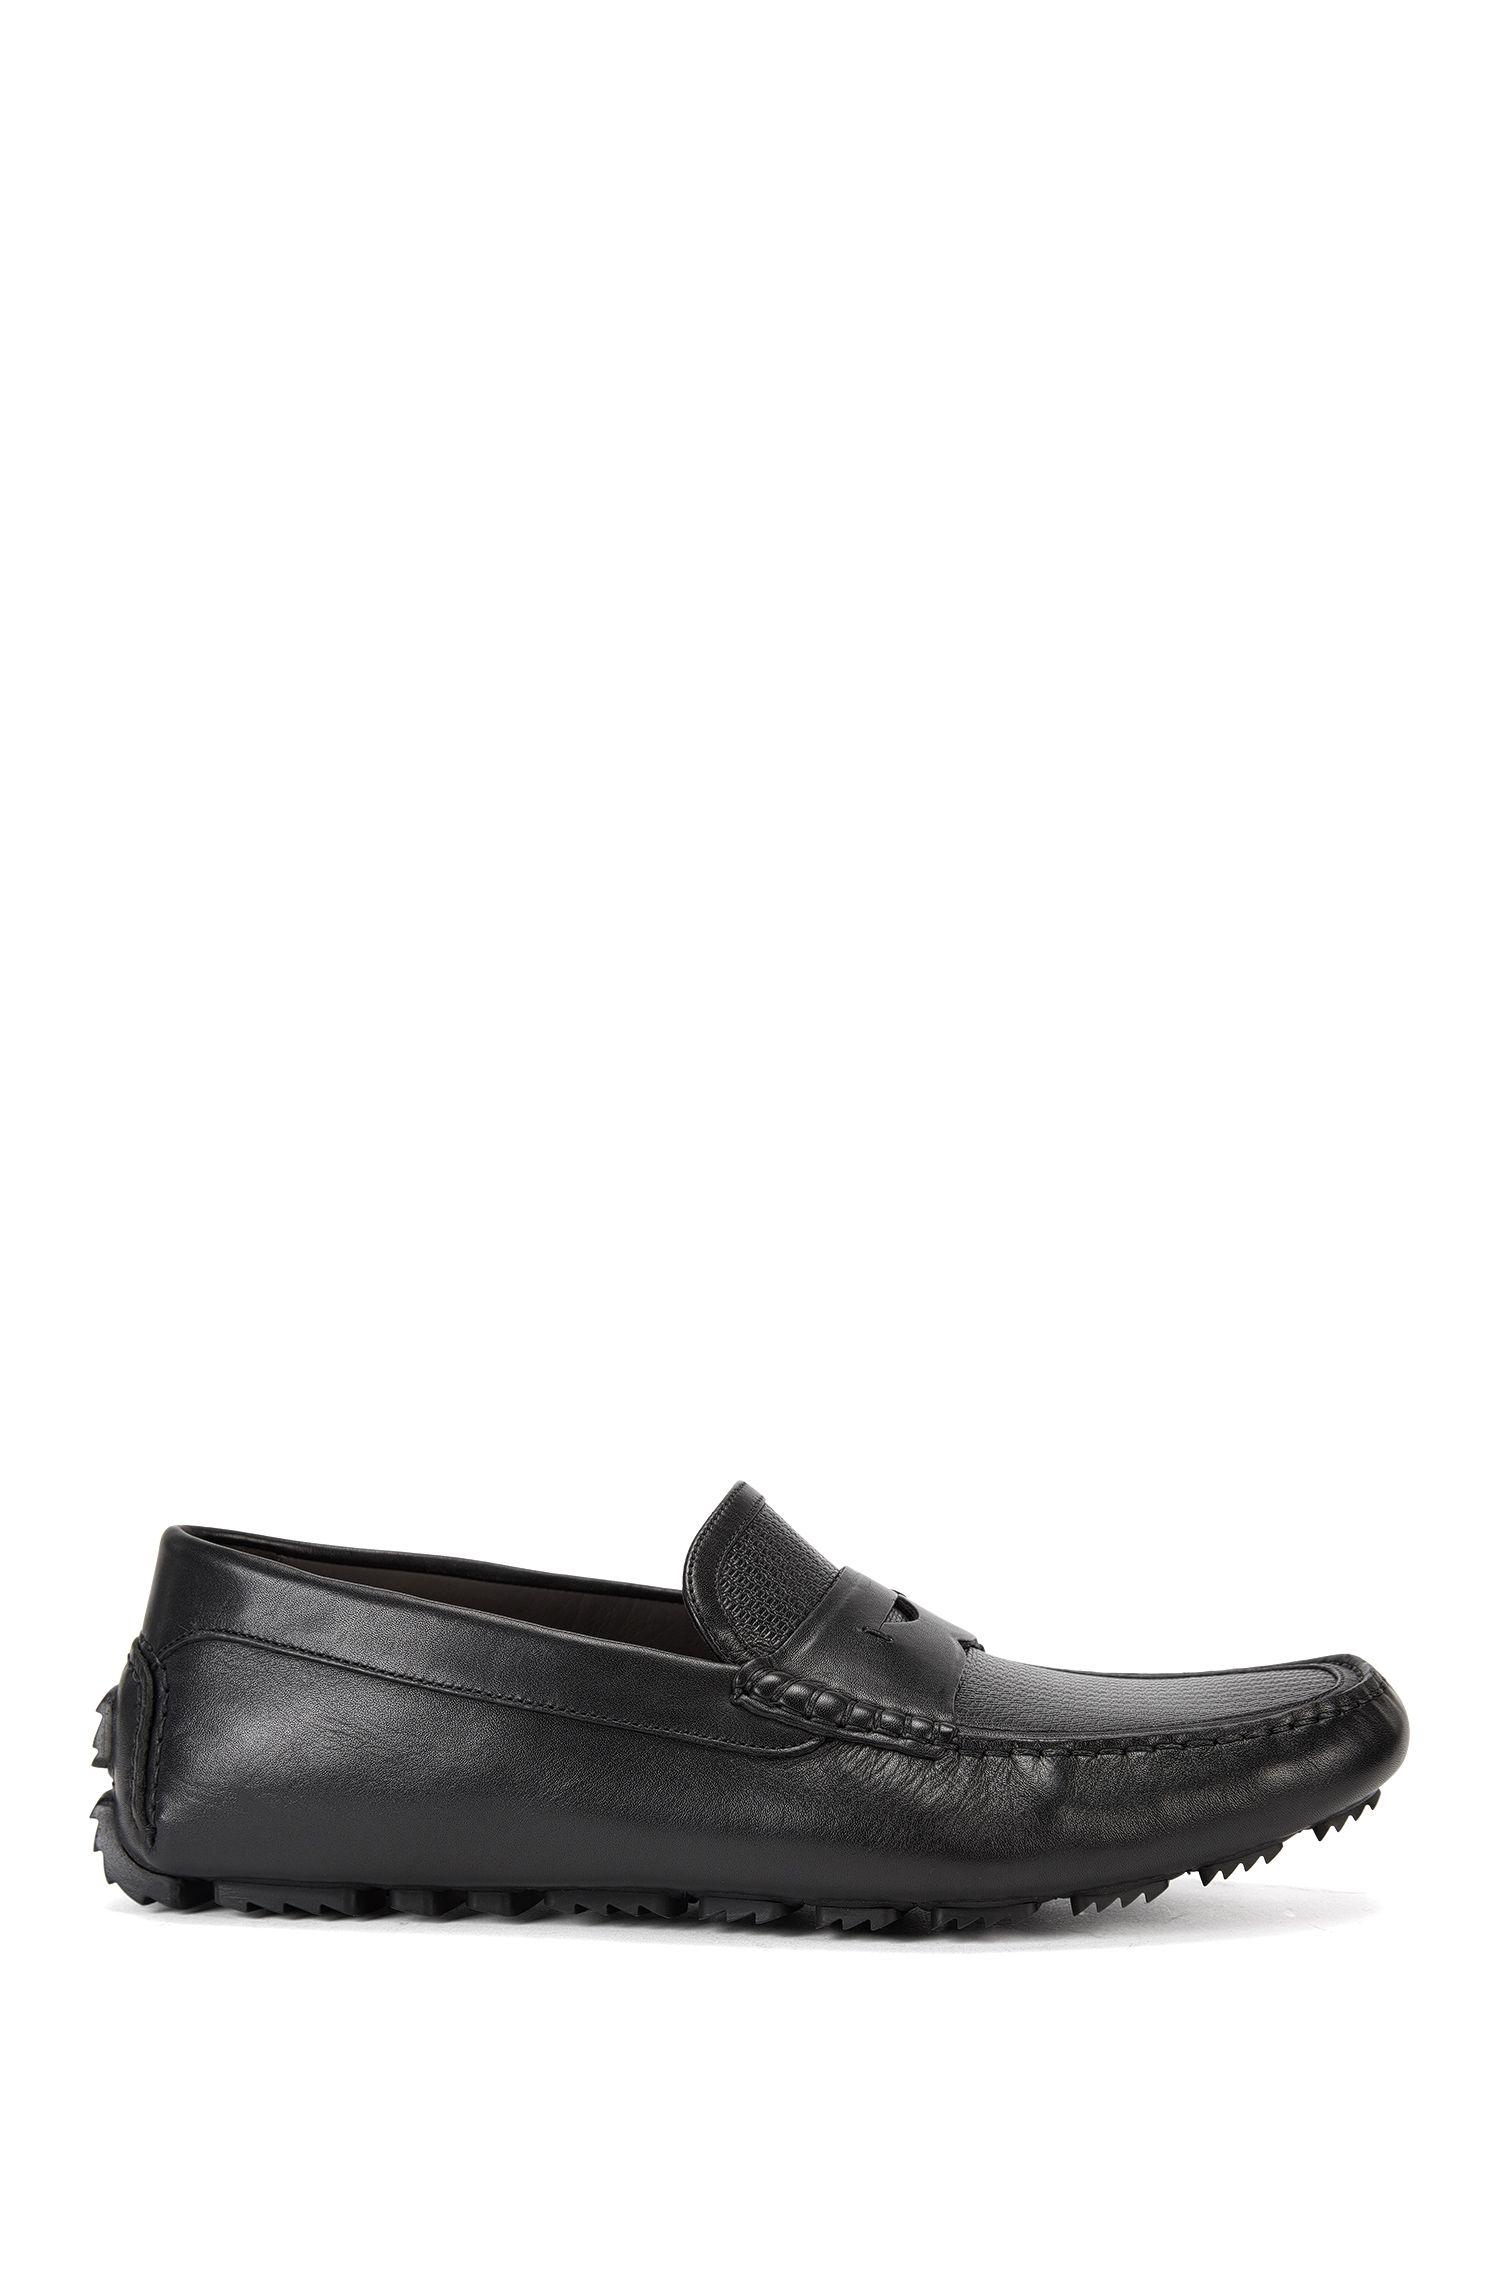 Chaussures en cuir de style mocassin